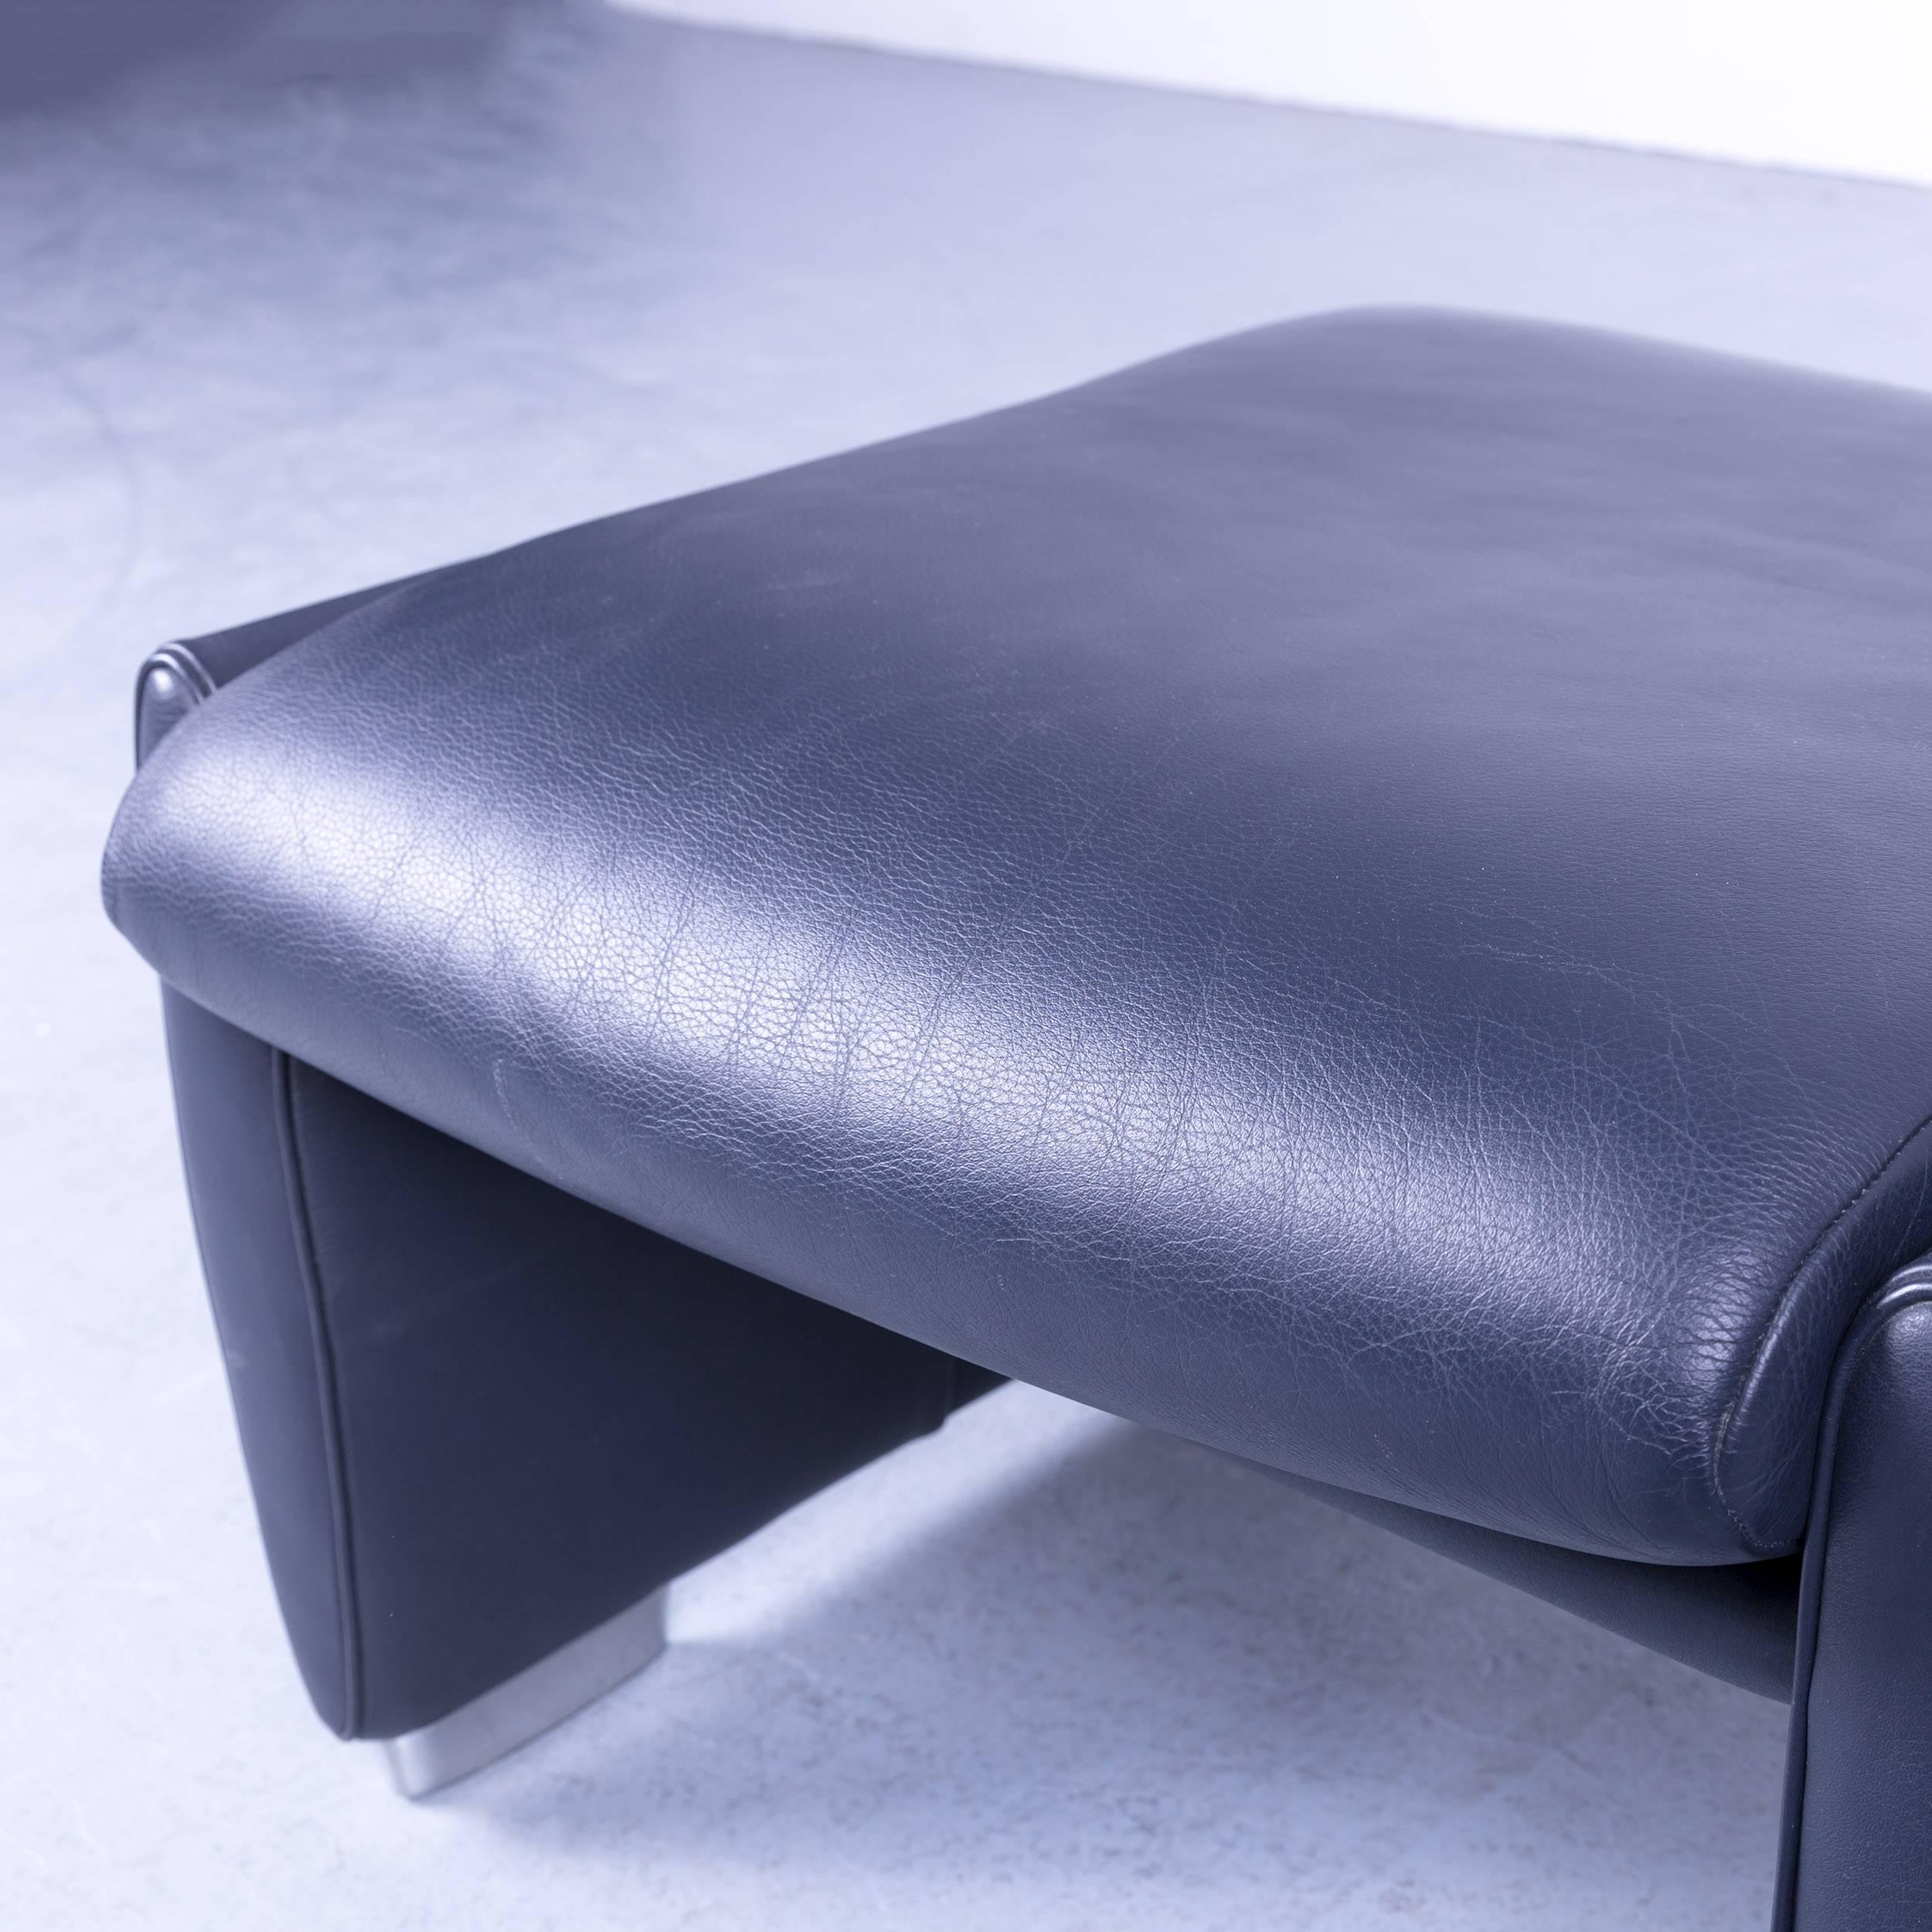 Groovy De Sede Ds 10 Designer Leather Footstool Dark Navy Blue Theyellowbook Wood Chair Design Ideas Theyellowbookinfo